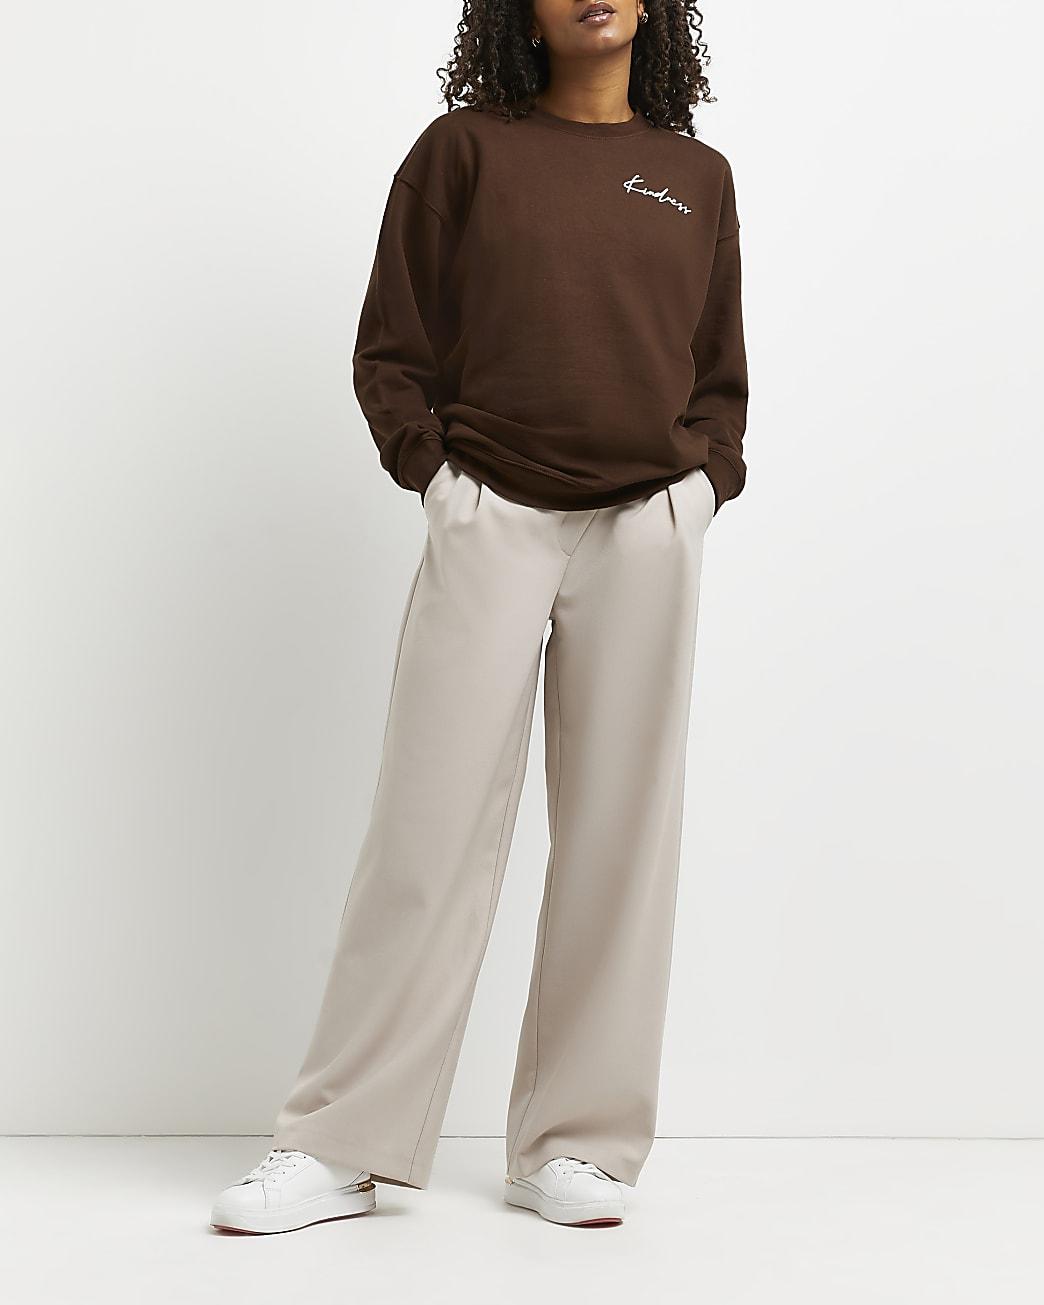 Brown graphic print sweatshirt